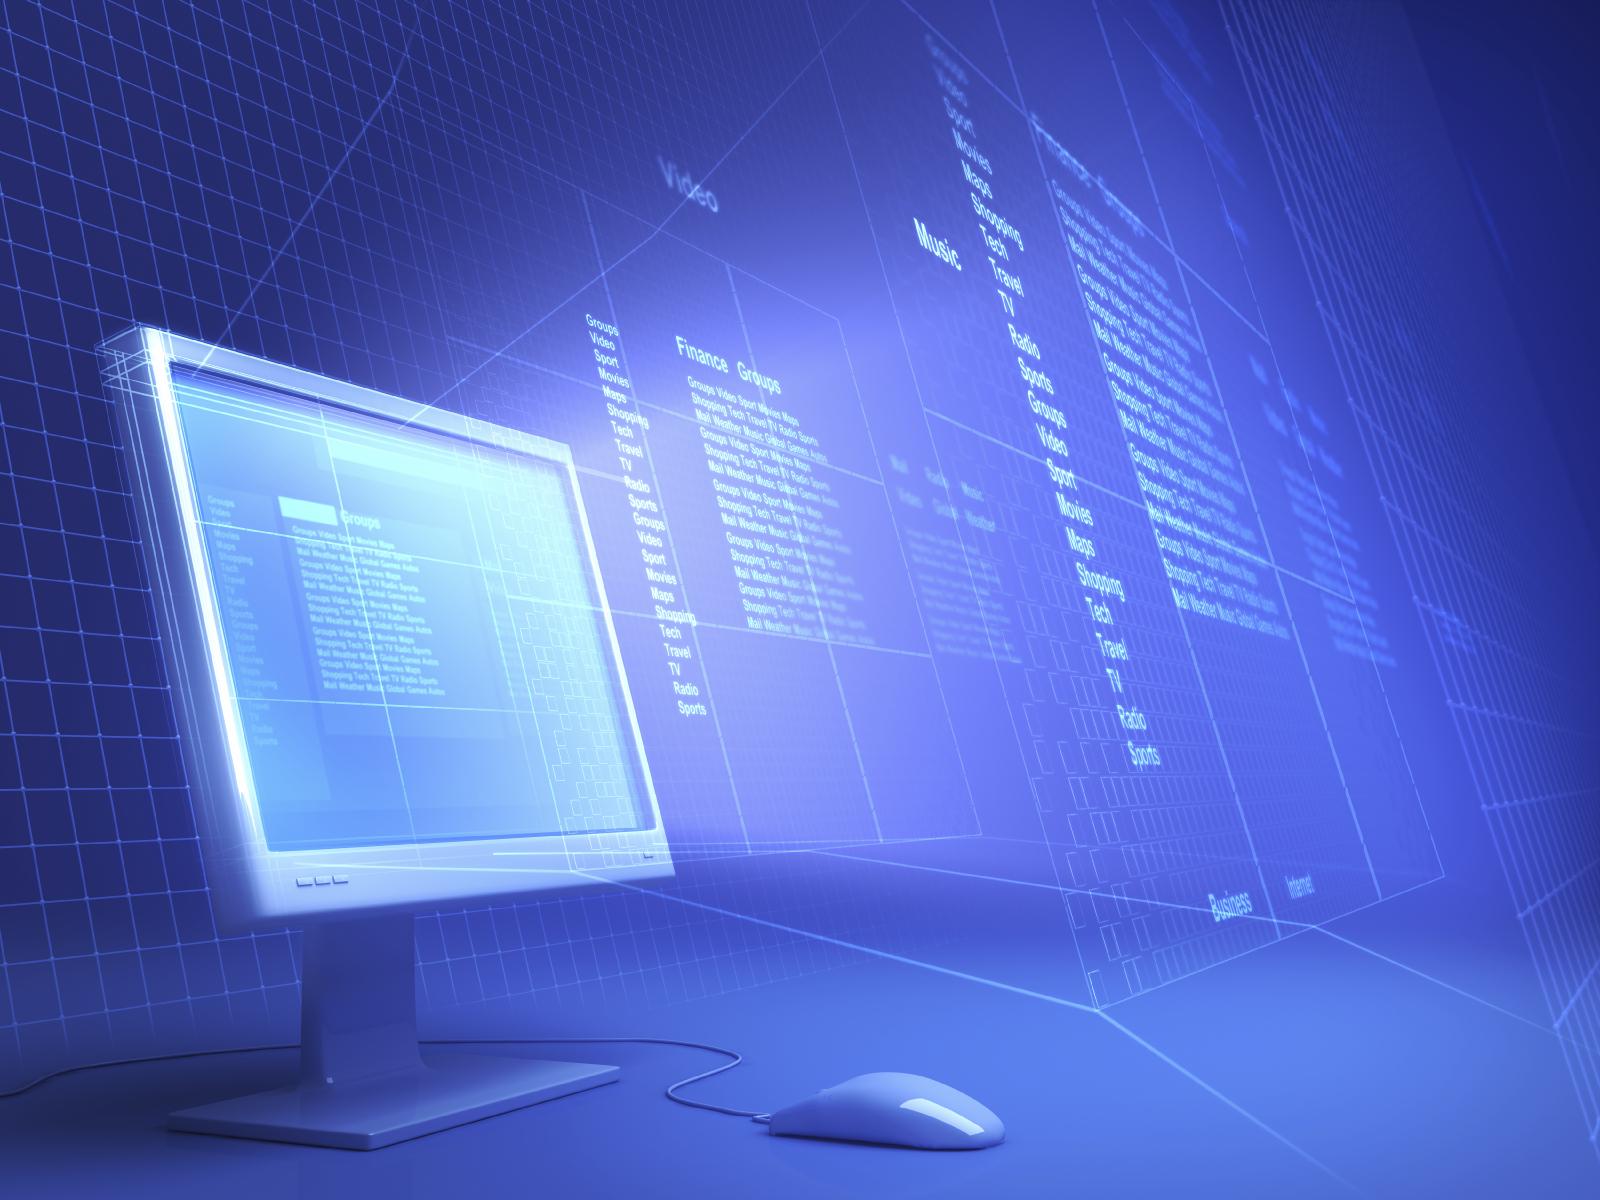 best websites for online jobs in saudi arabia life in saudi arabia best websites for online jobs in saudi arabia